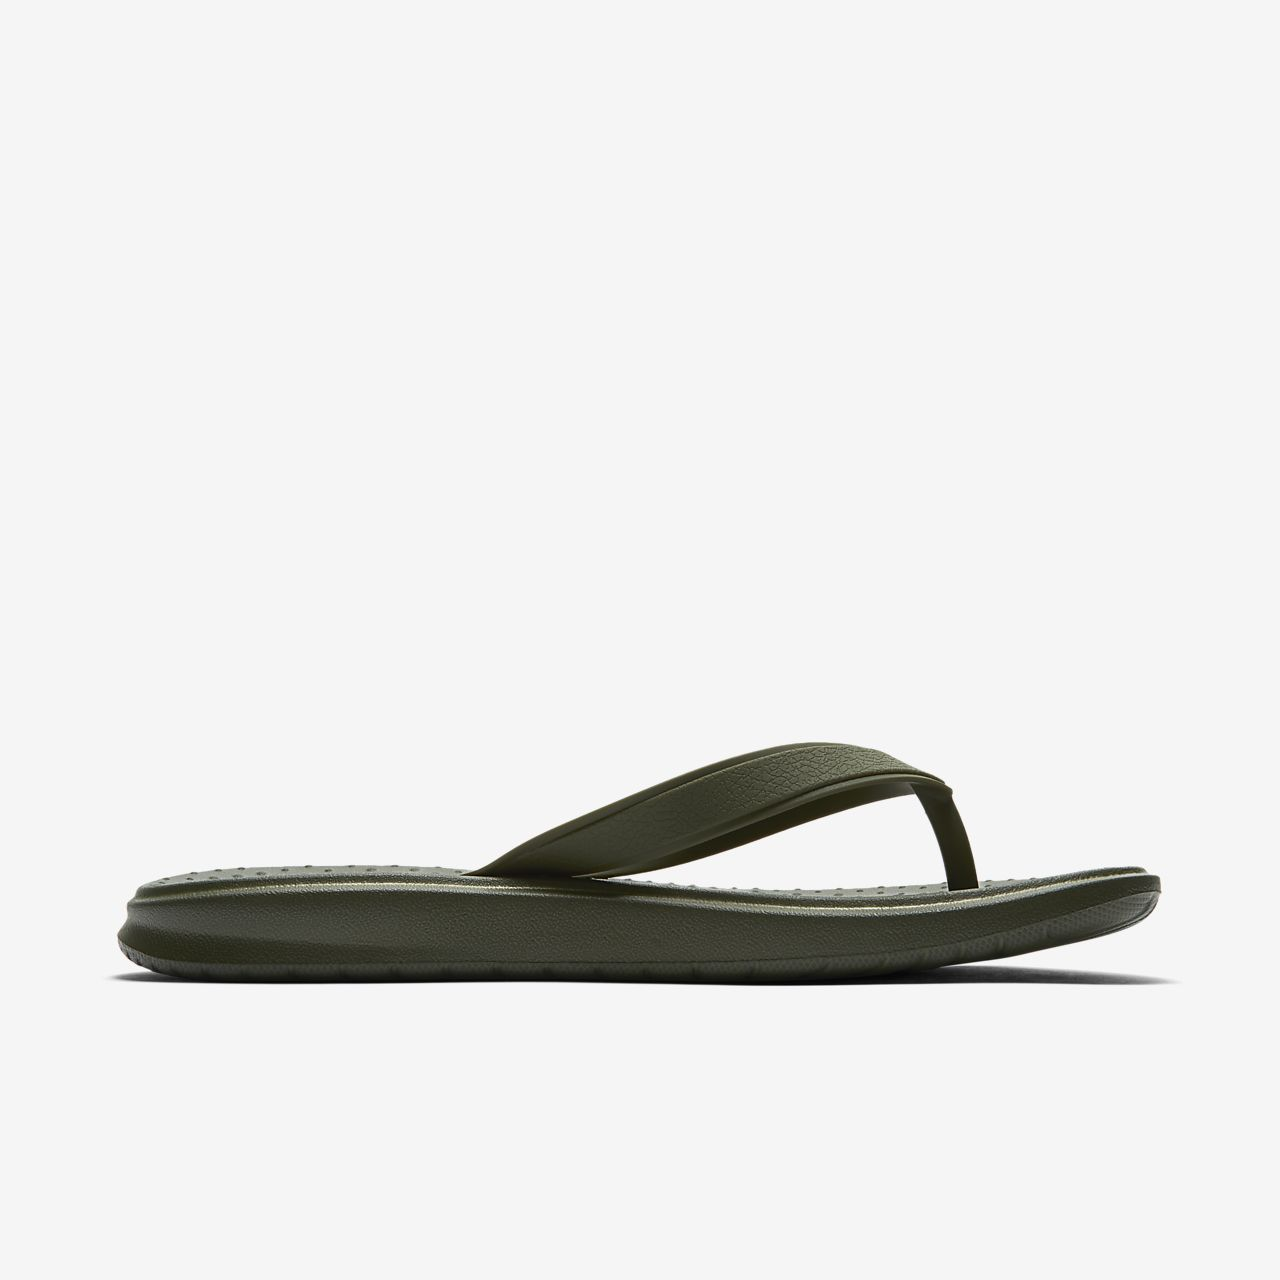 a692b3df4 Nike Solay Men's Flip-Flop. Nike.com CA